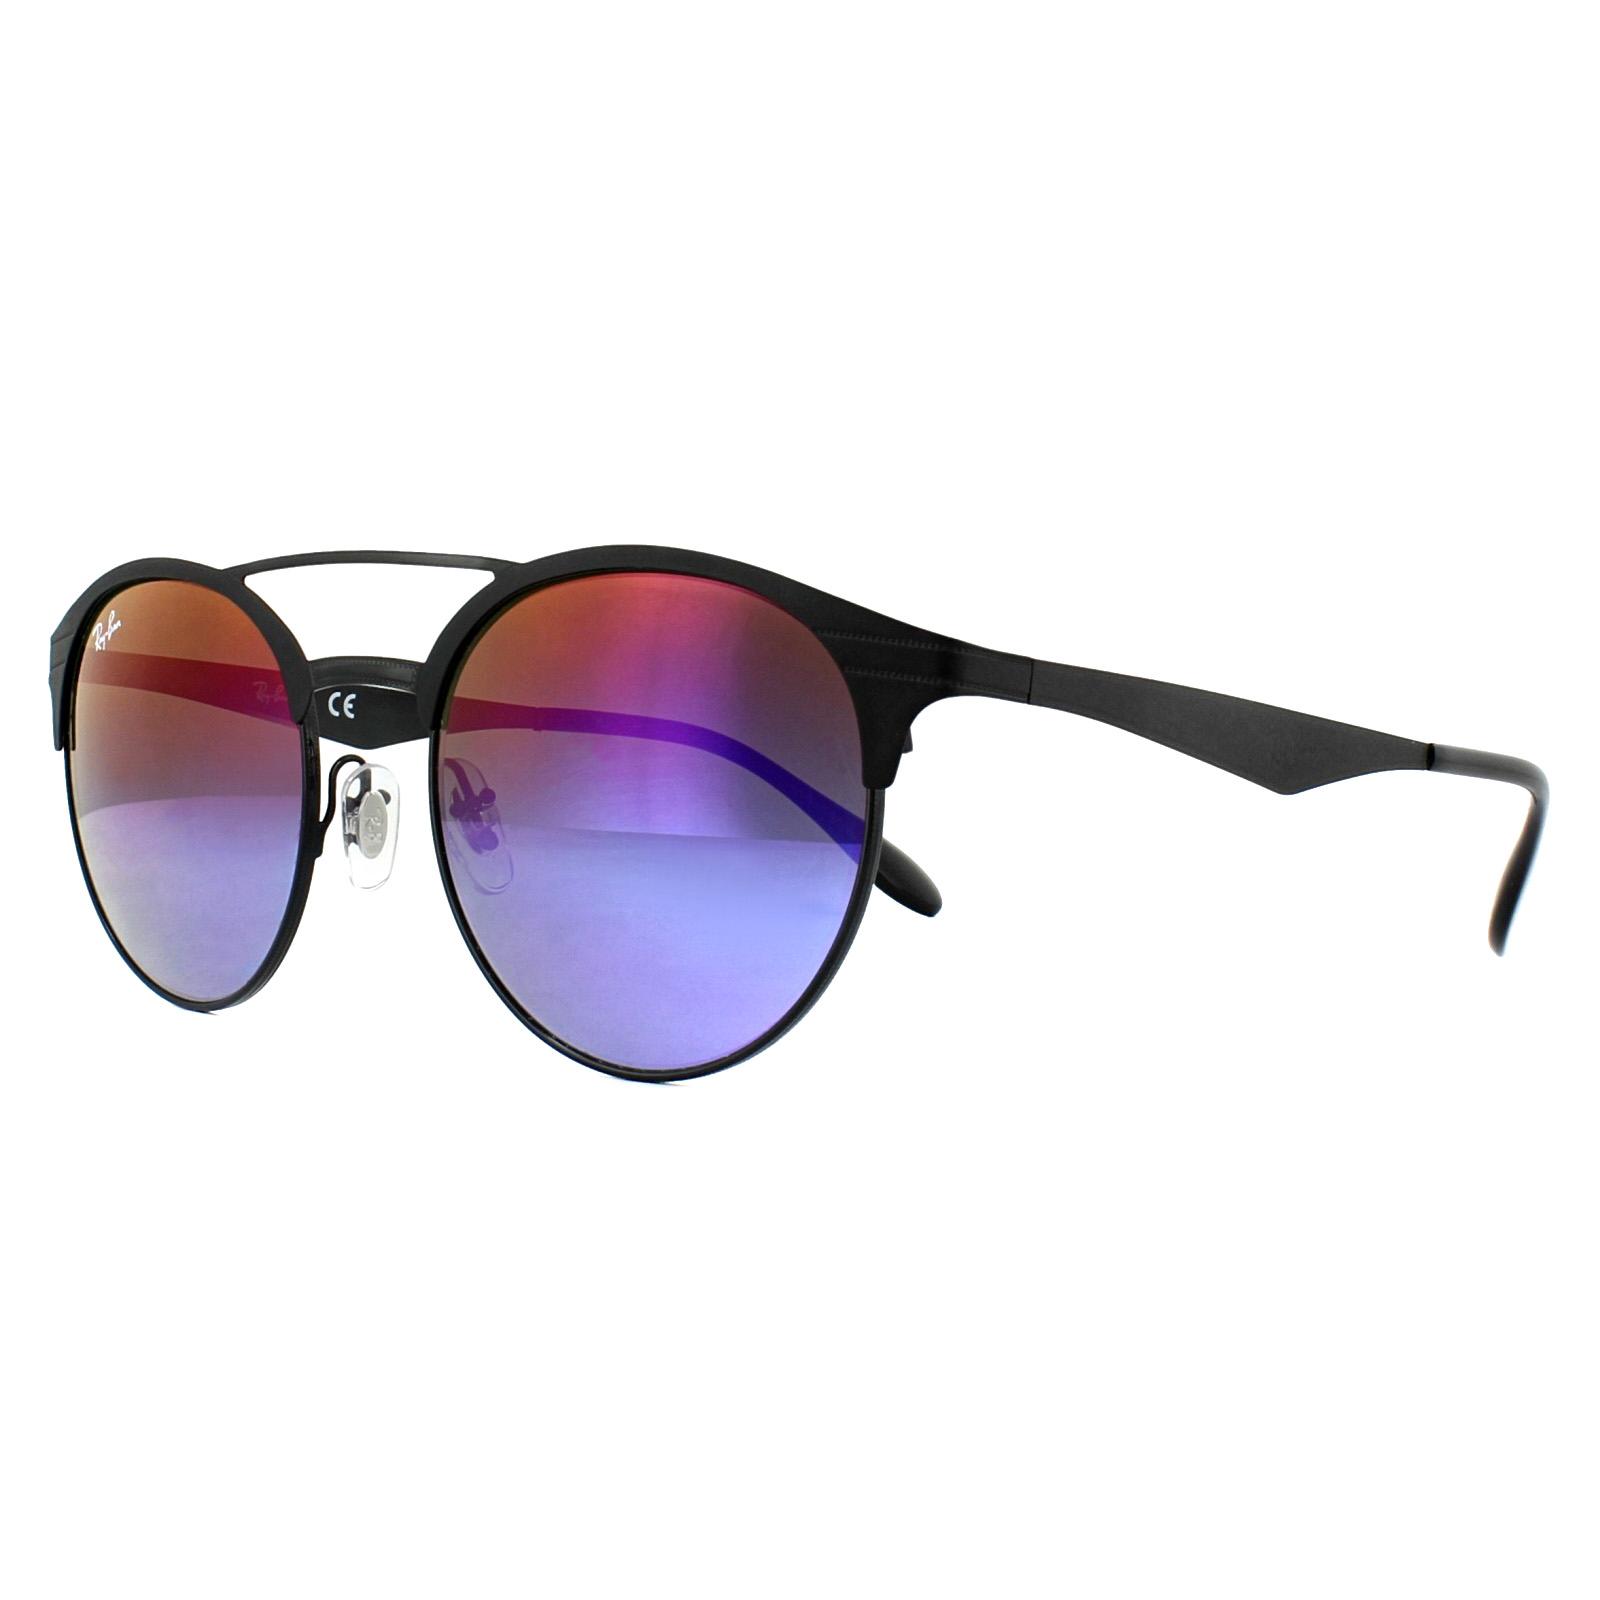 8b2639851a Sentinel Ray-Ban Sunglasses 3545 186 B1 Black Blue Violet Gradient Mirror  51mm